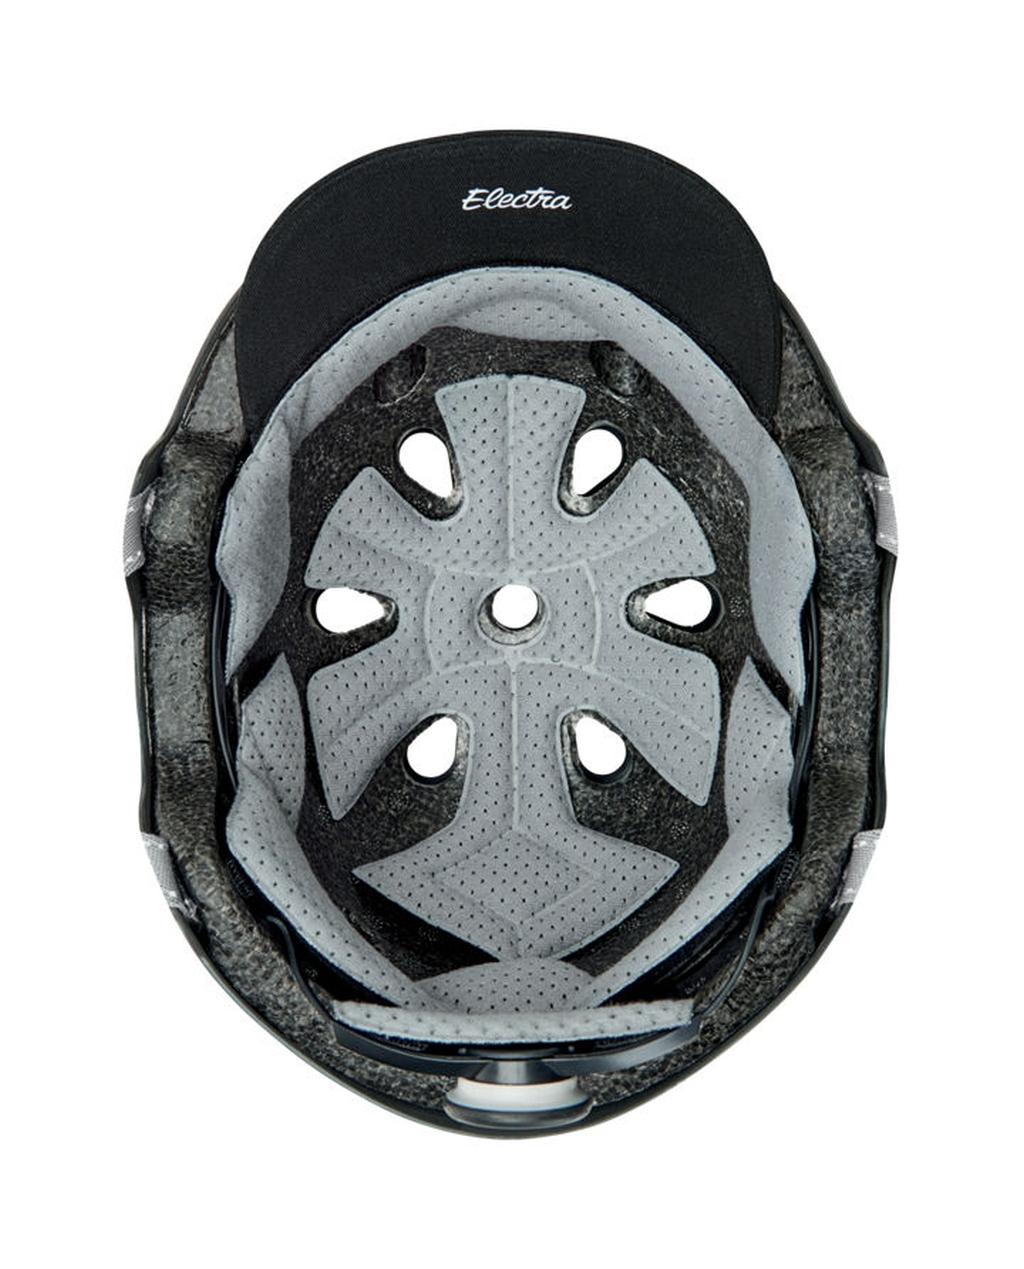 Electra - Bike Helmet - Heartchya